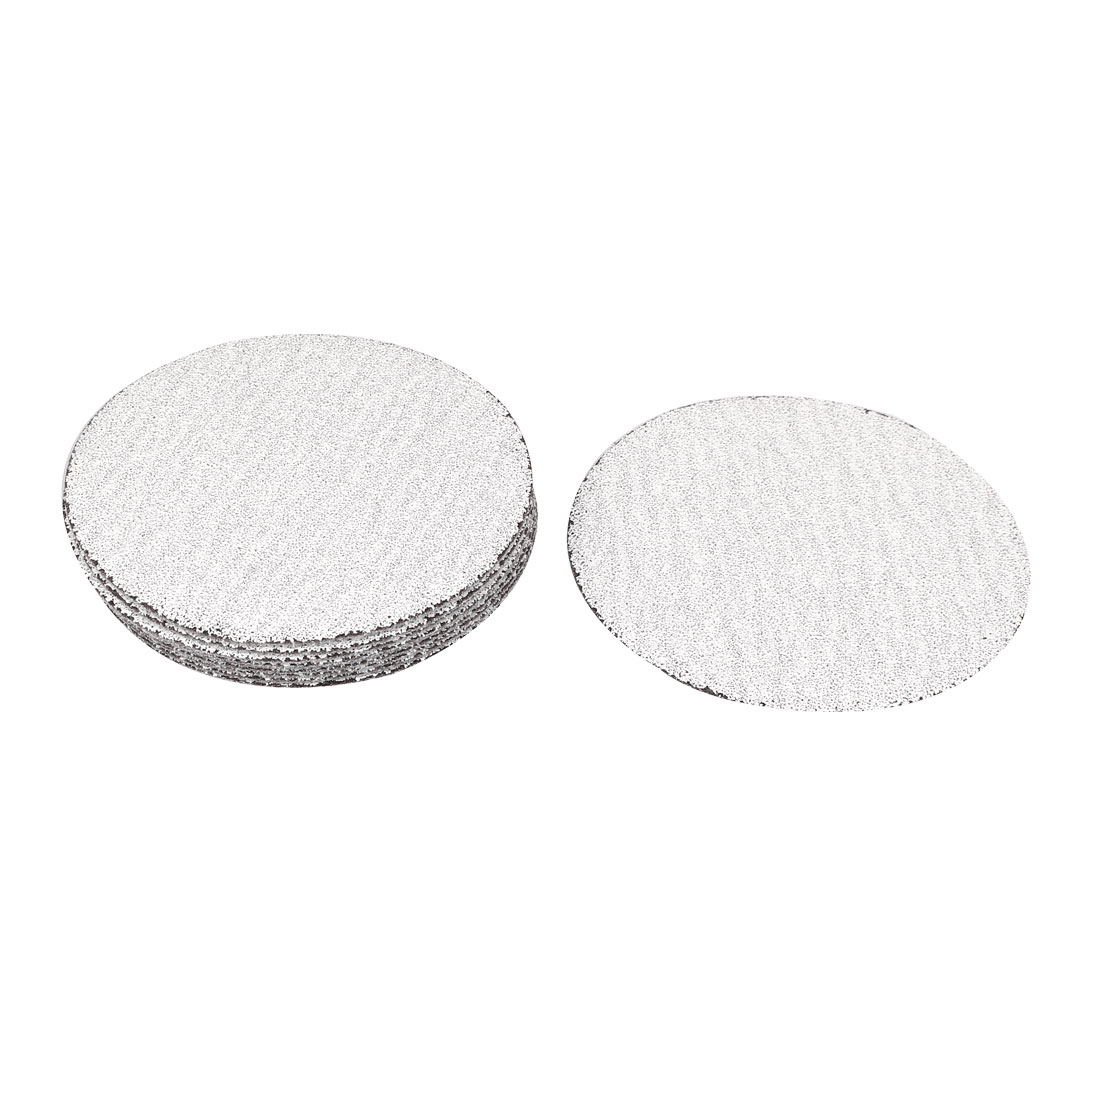 "4"" Dia Round Polishing Dry Abrasive Sanding Sandpaper Sheet Disc 60 Grit 10 Pcs"